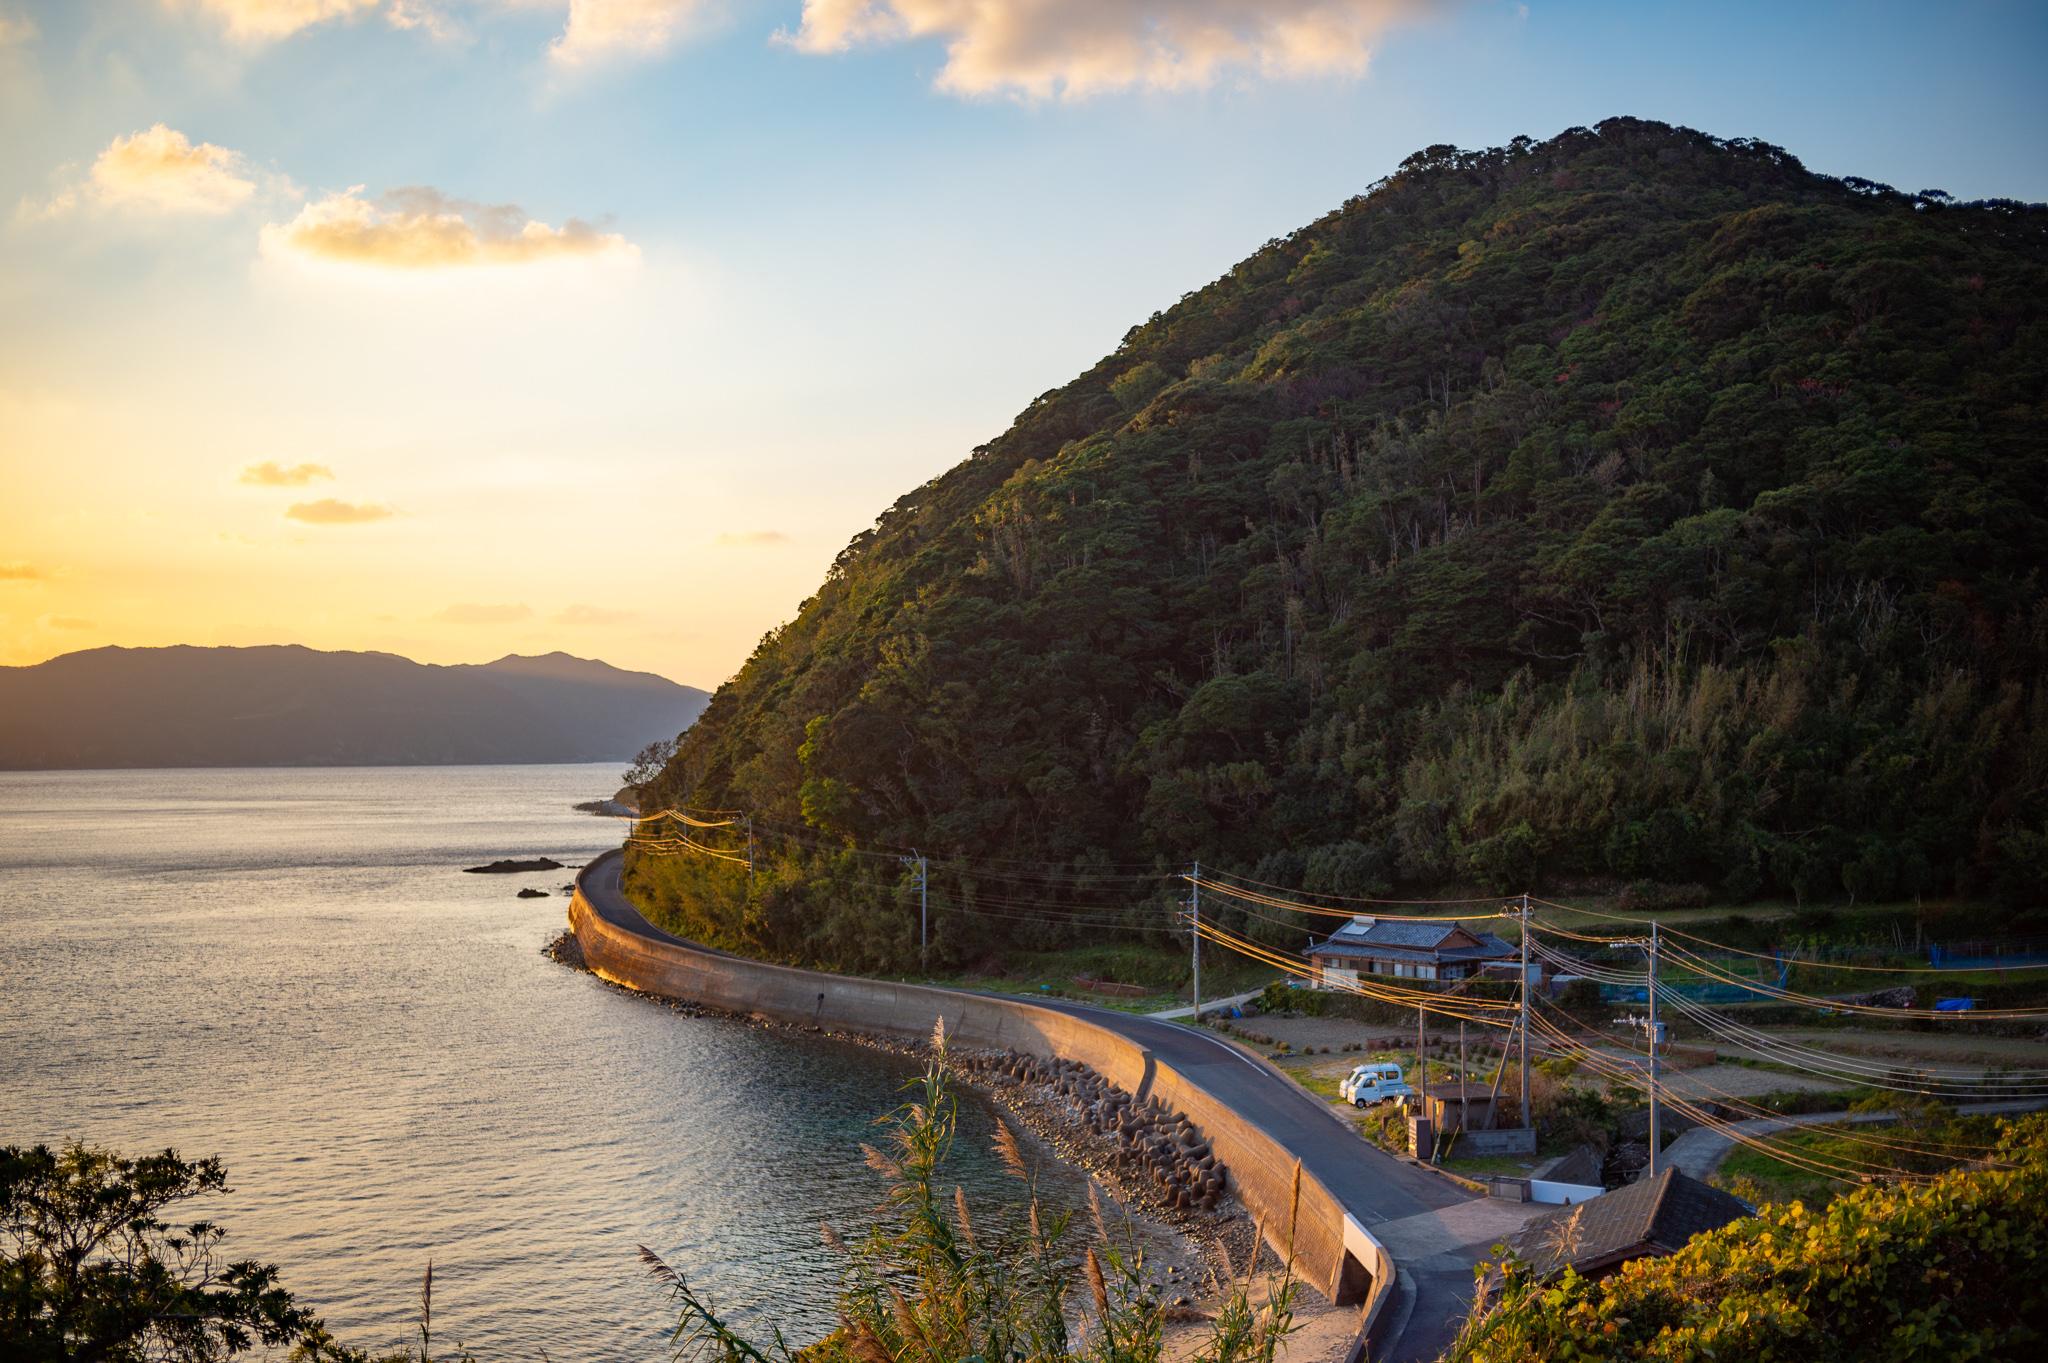 Island Hopping the 3 Islands of Goto City